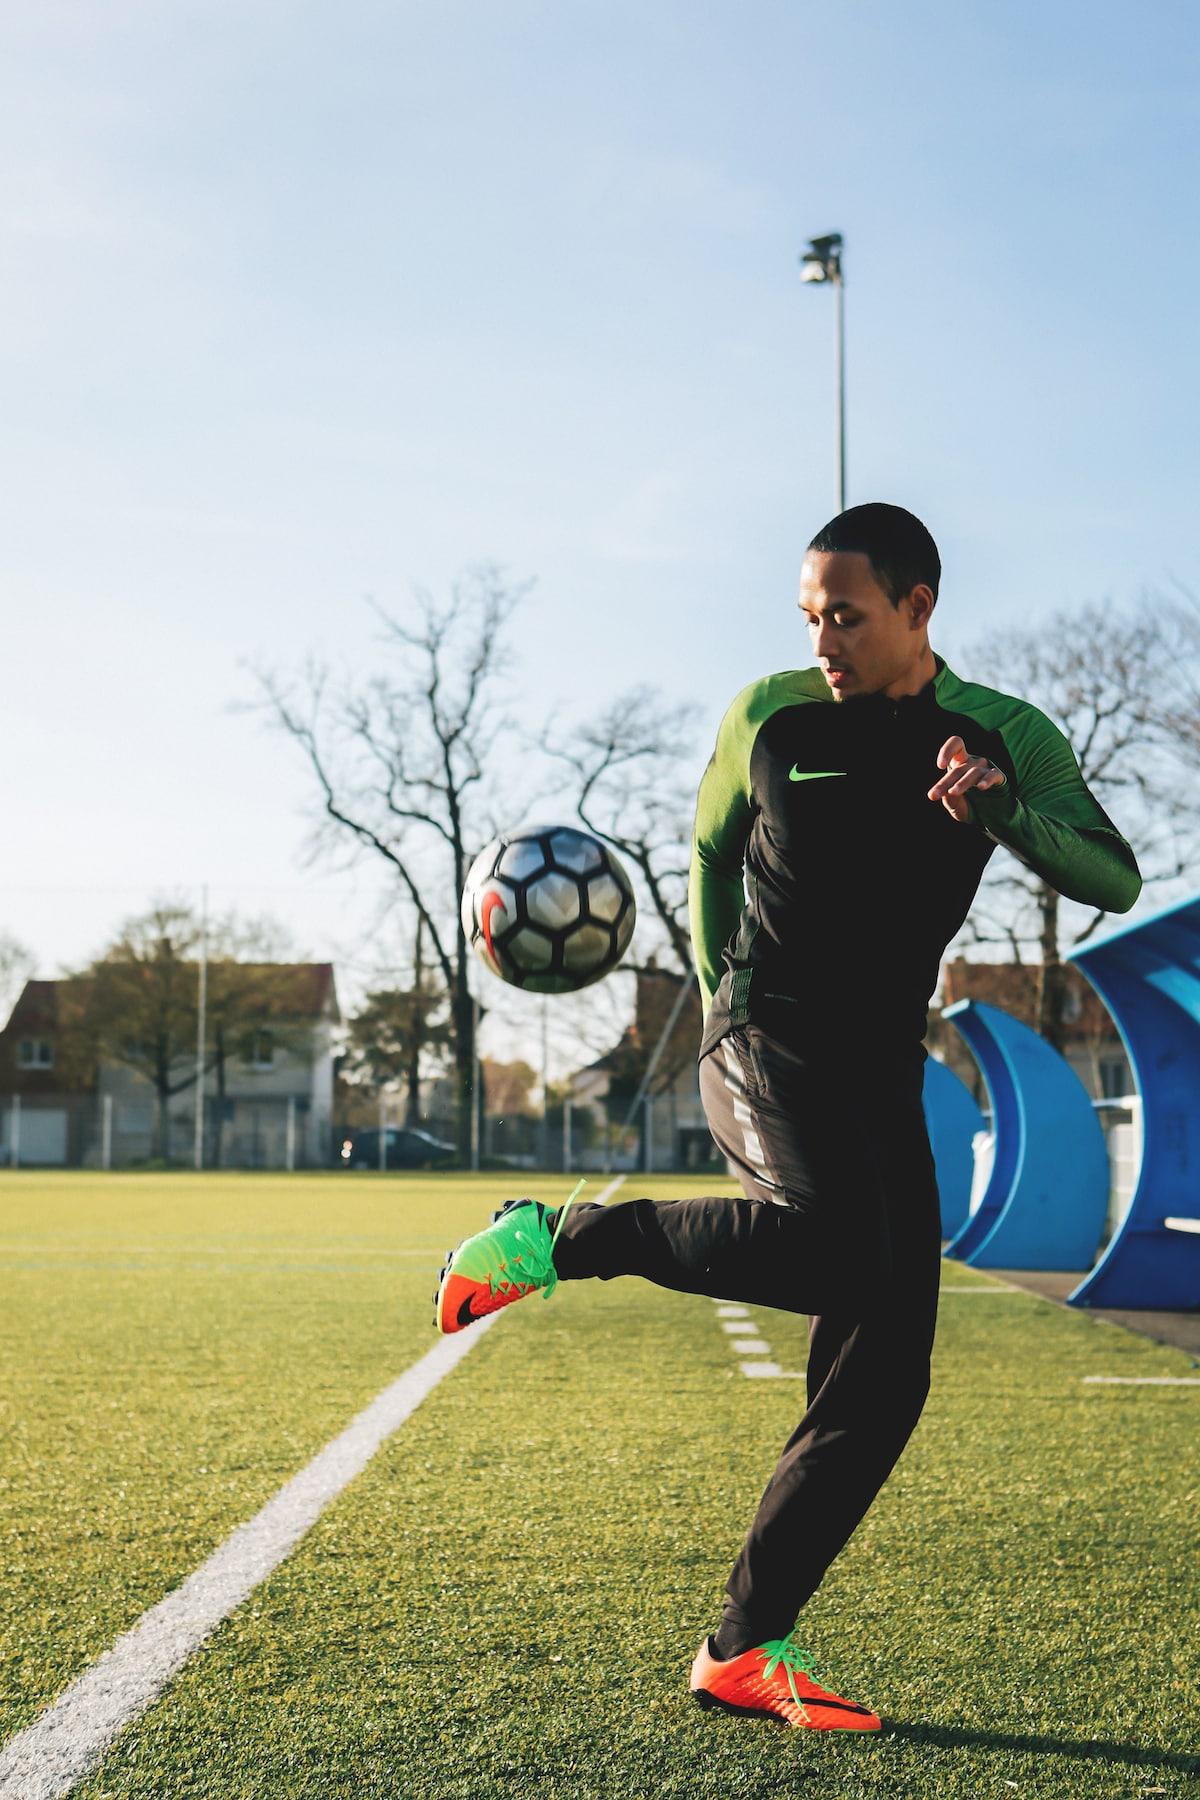 chaussures-football-Nike-Hypervenom-Phantom-3-img8